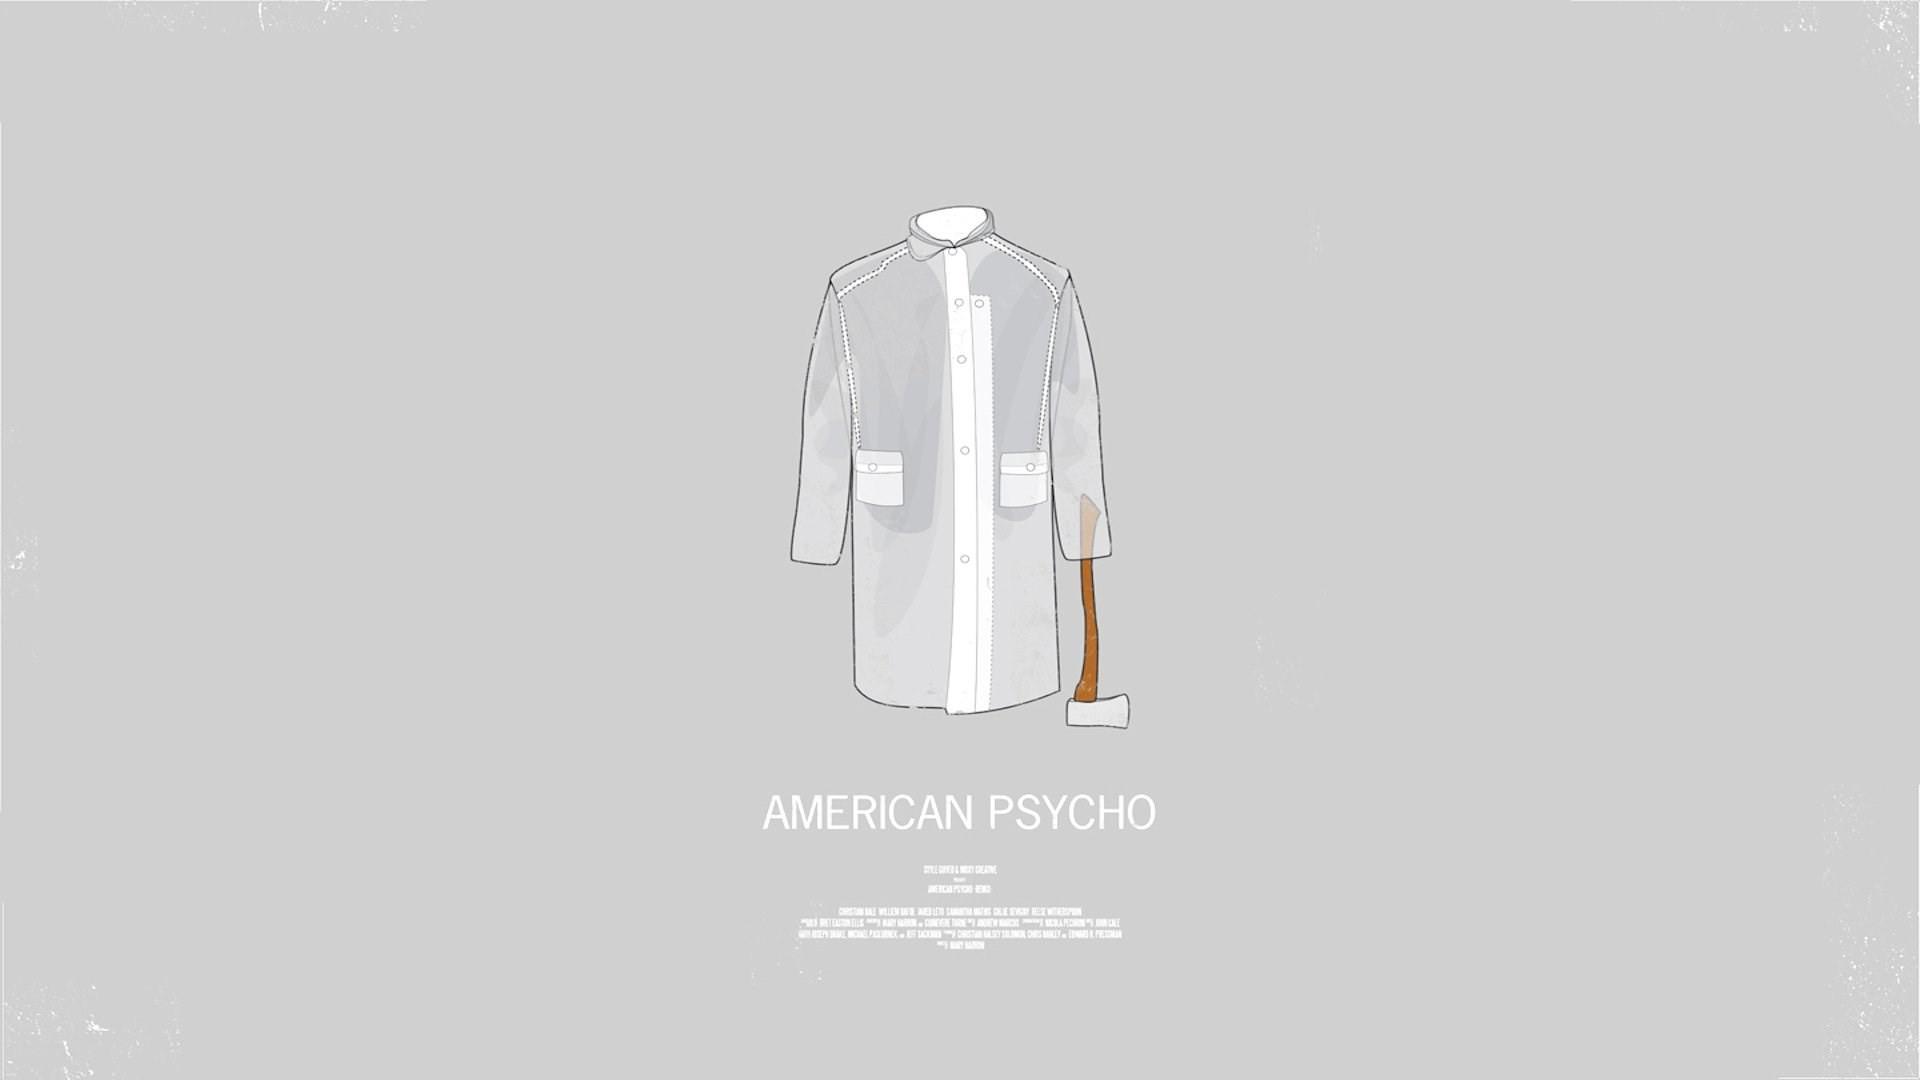 american psycho wallpaper …